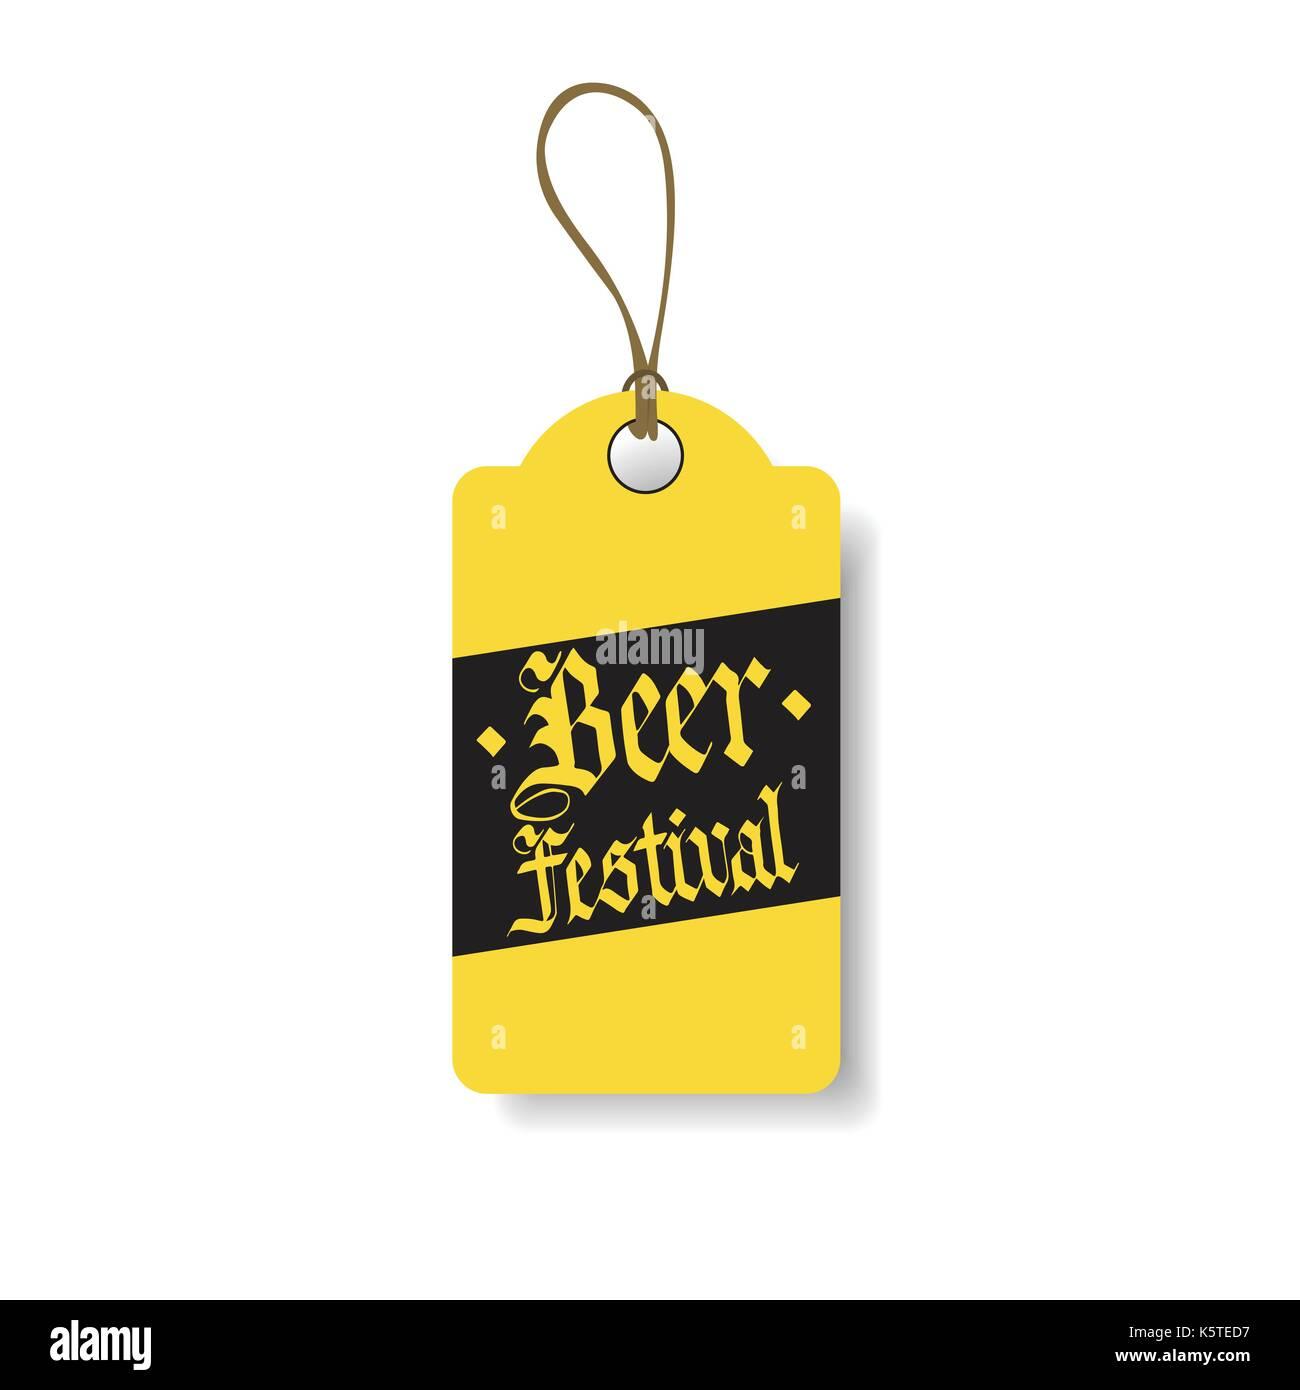 Oktoberfest Tag German Beer Festival Flyer Design Icon - Stock Image